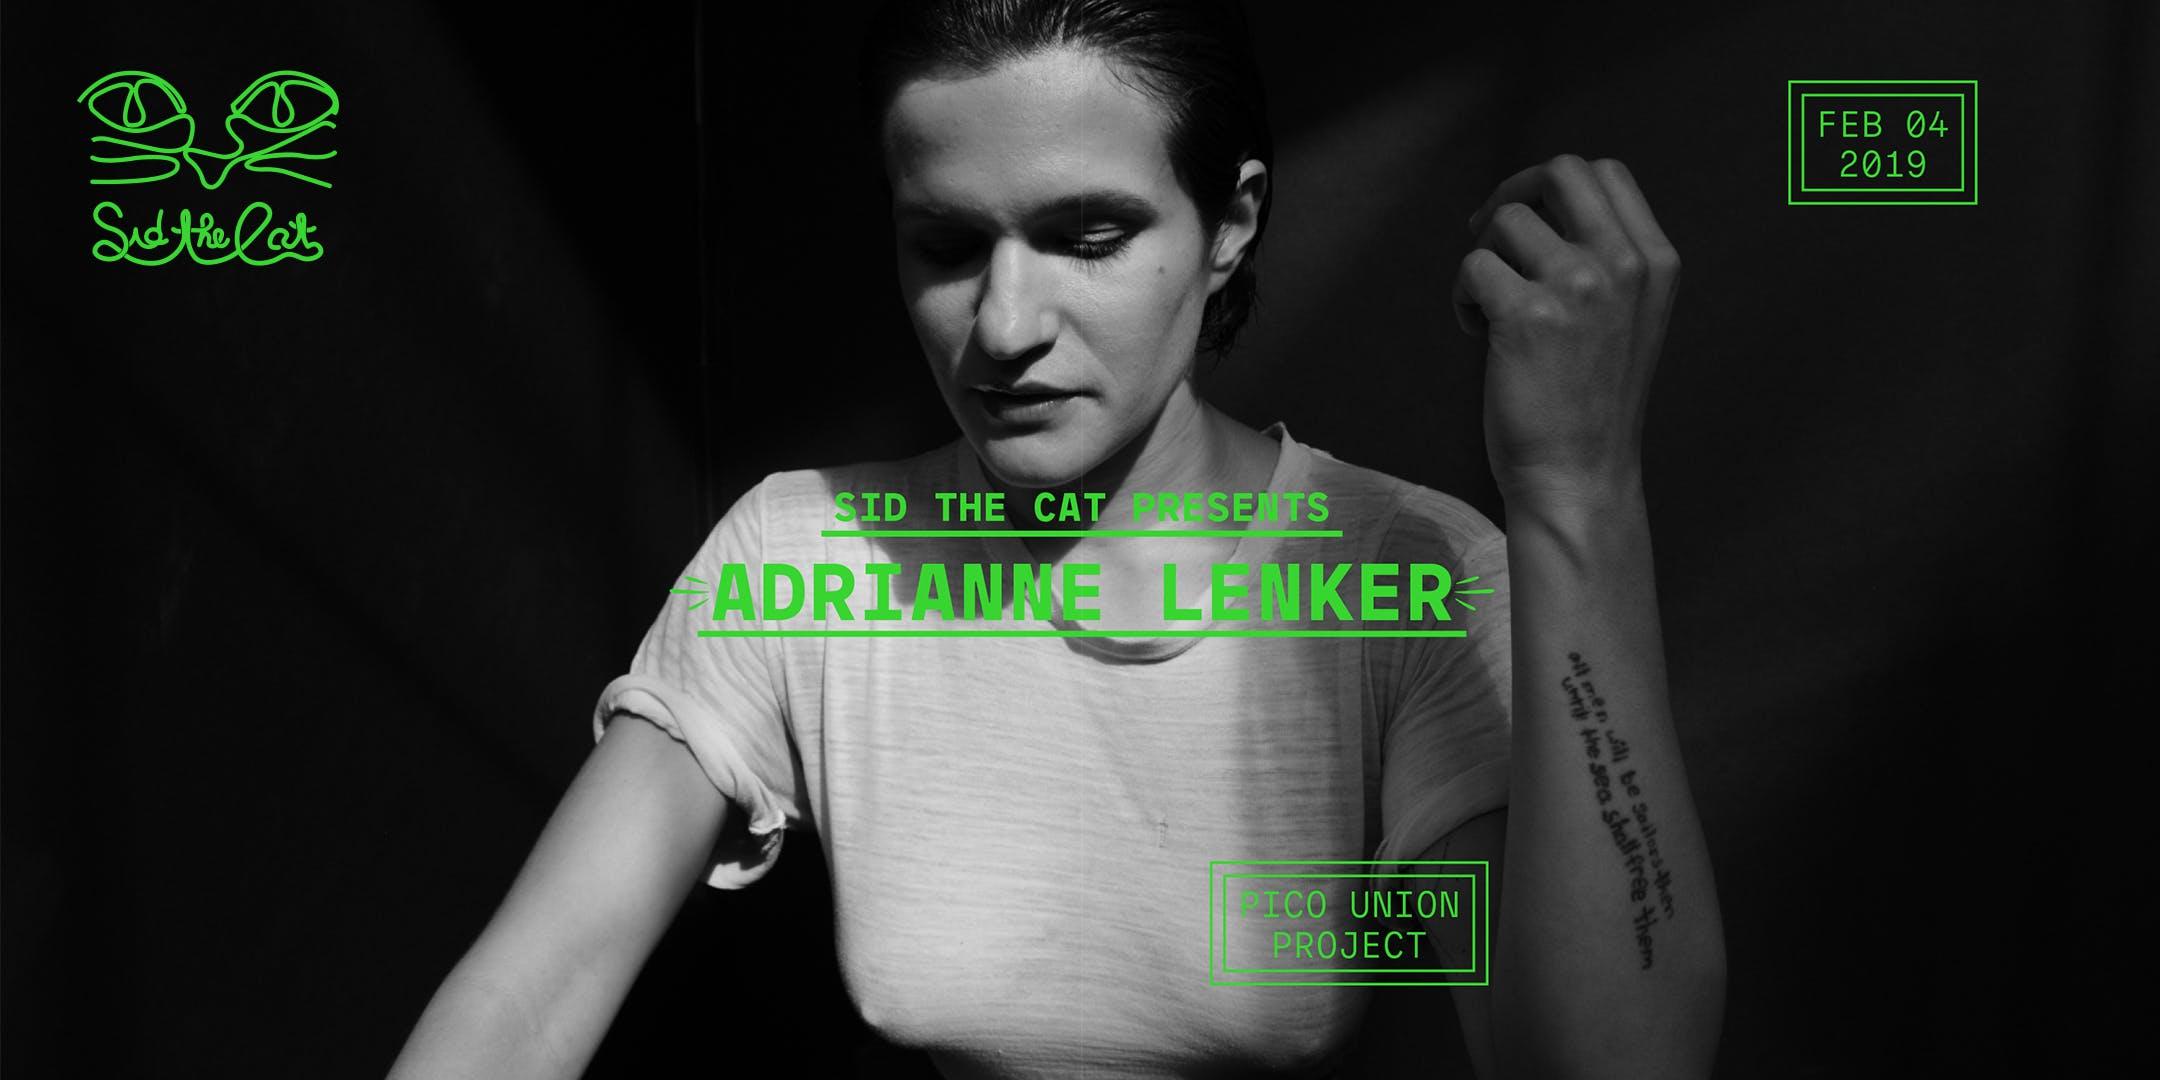 Adrianne Lenker (of Big Thief)